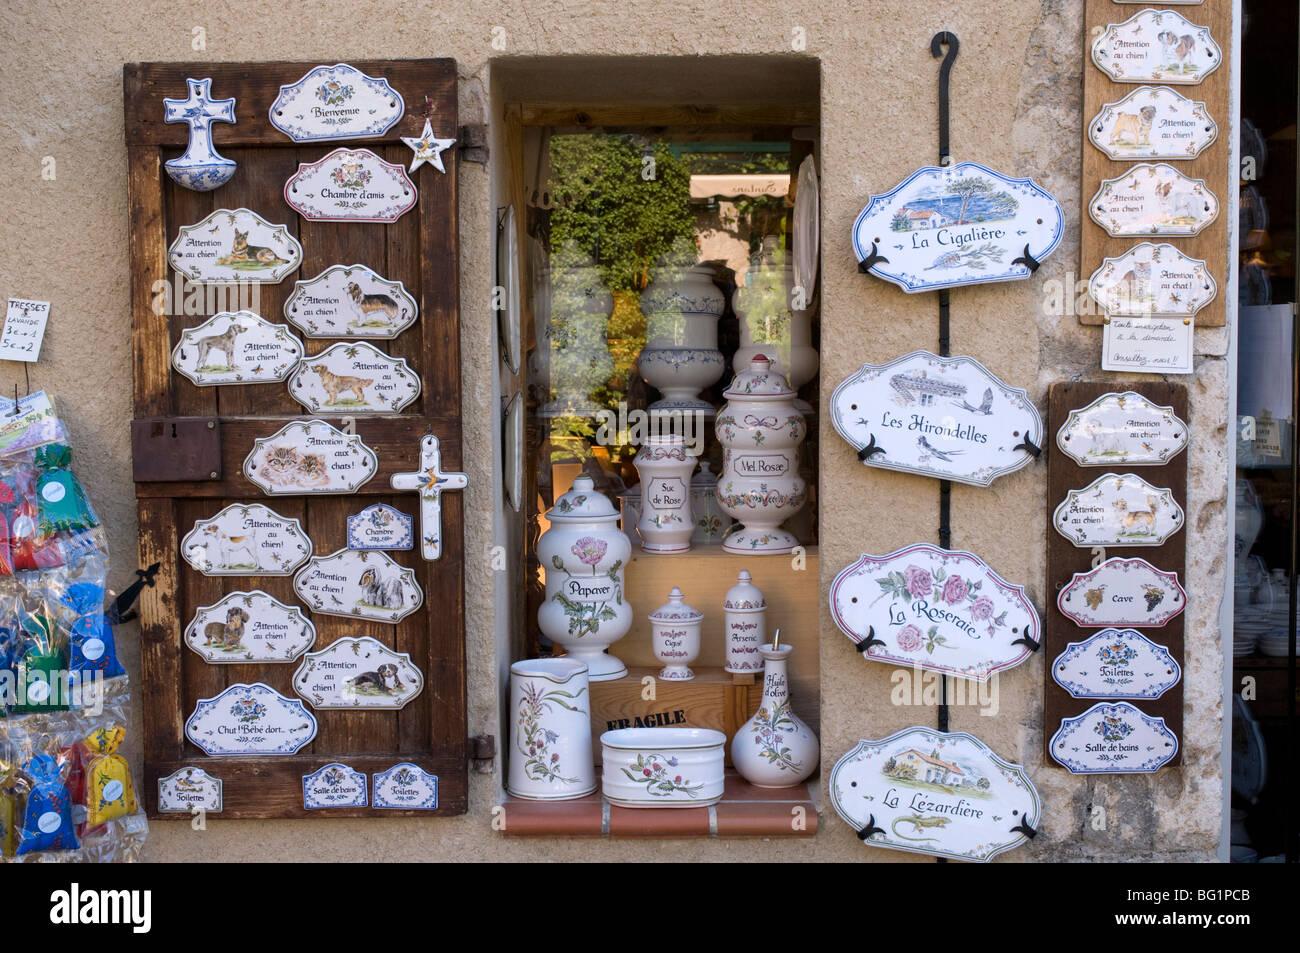 Faience pottery, Moustiers-Sainte-Marie, Alpes-de-Haute-Provence, Provence, France, Europe Stock Photo